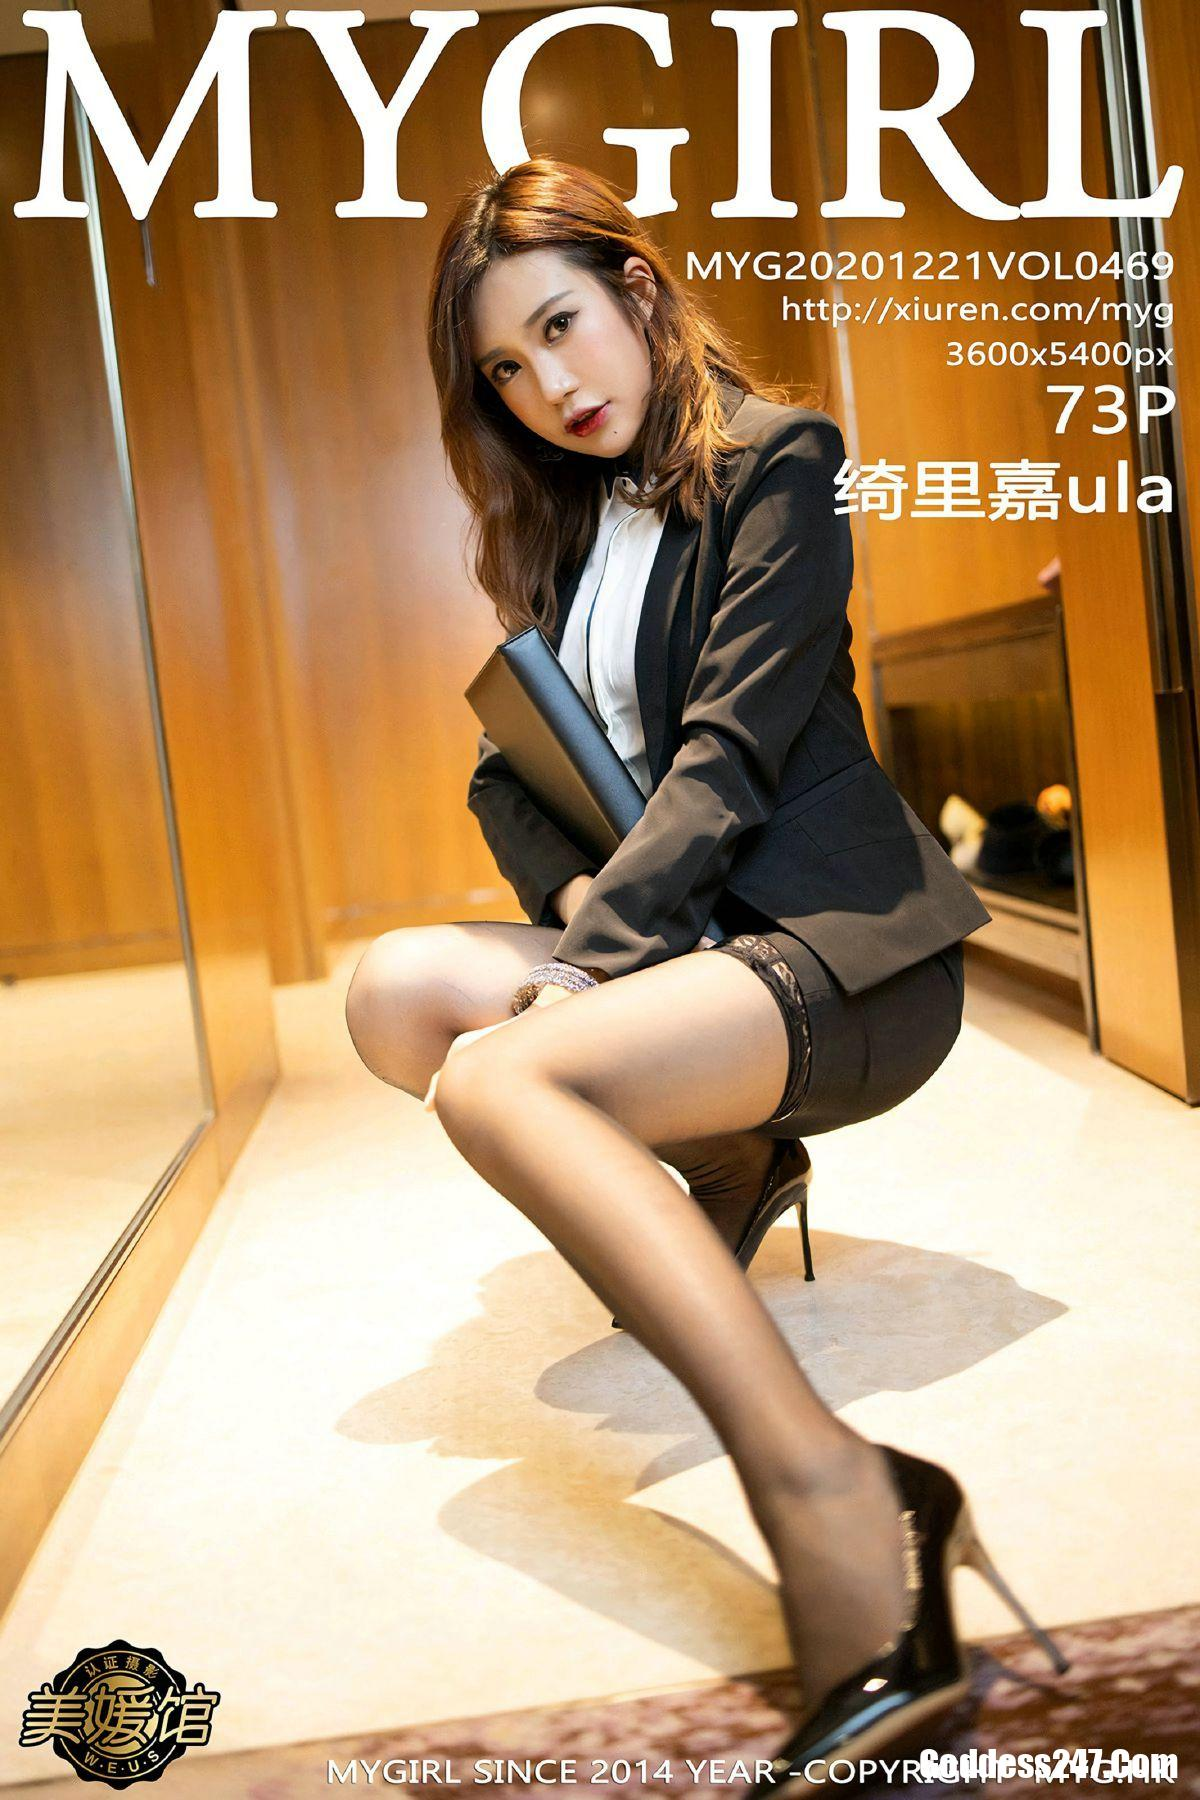 MyGirl美媛馆 Vol.469 绮里嘉ula